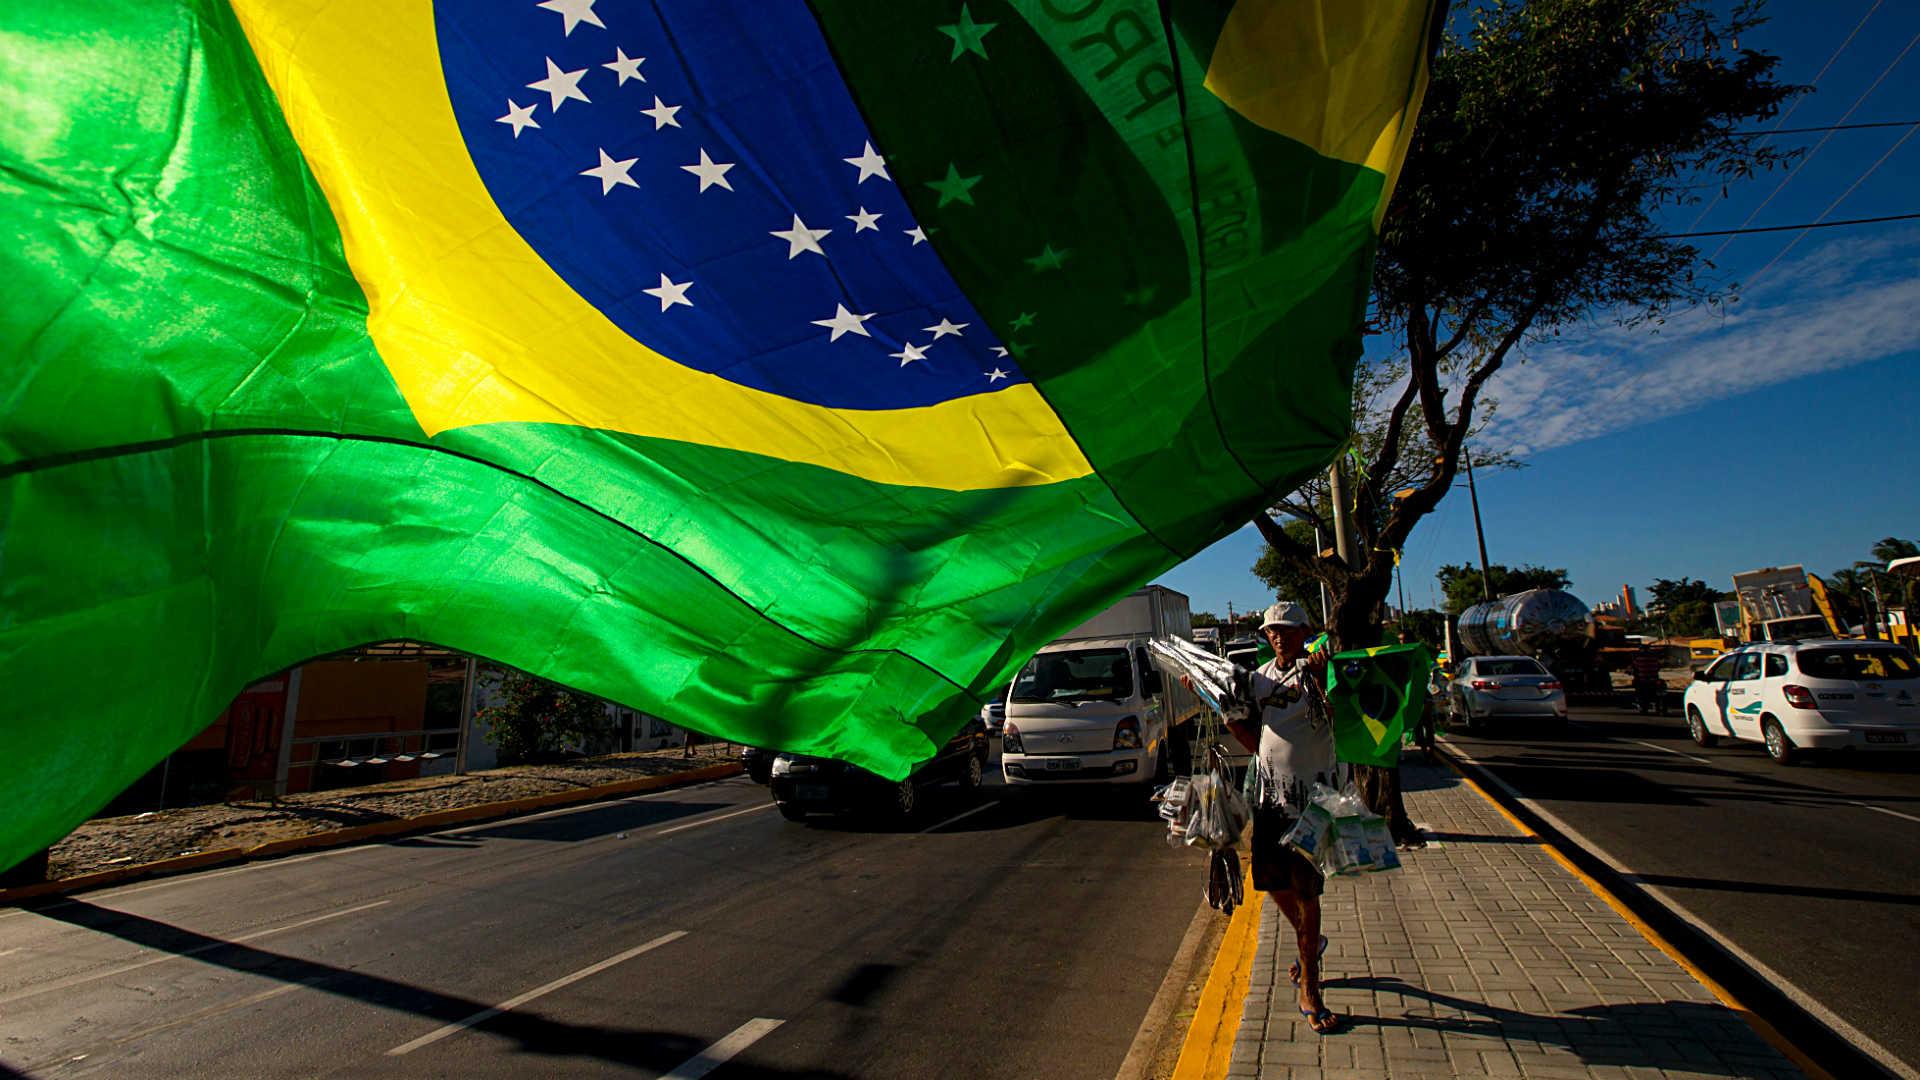 Brazil-World-Cup-061214-AP-FTR.jpg